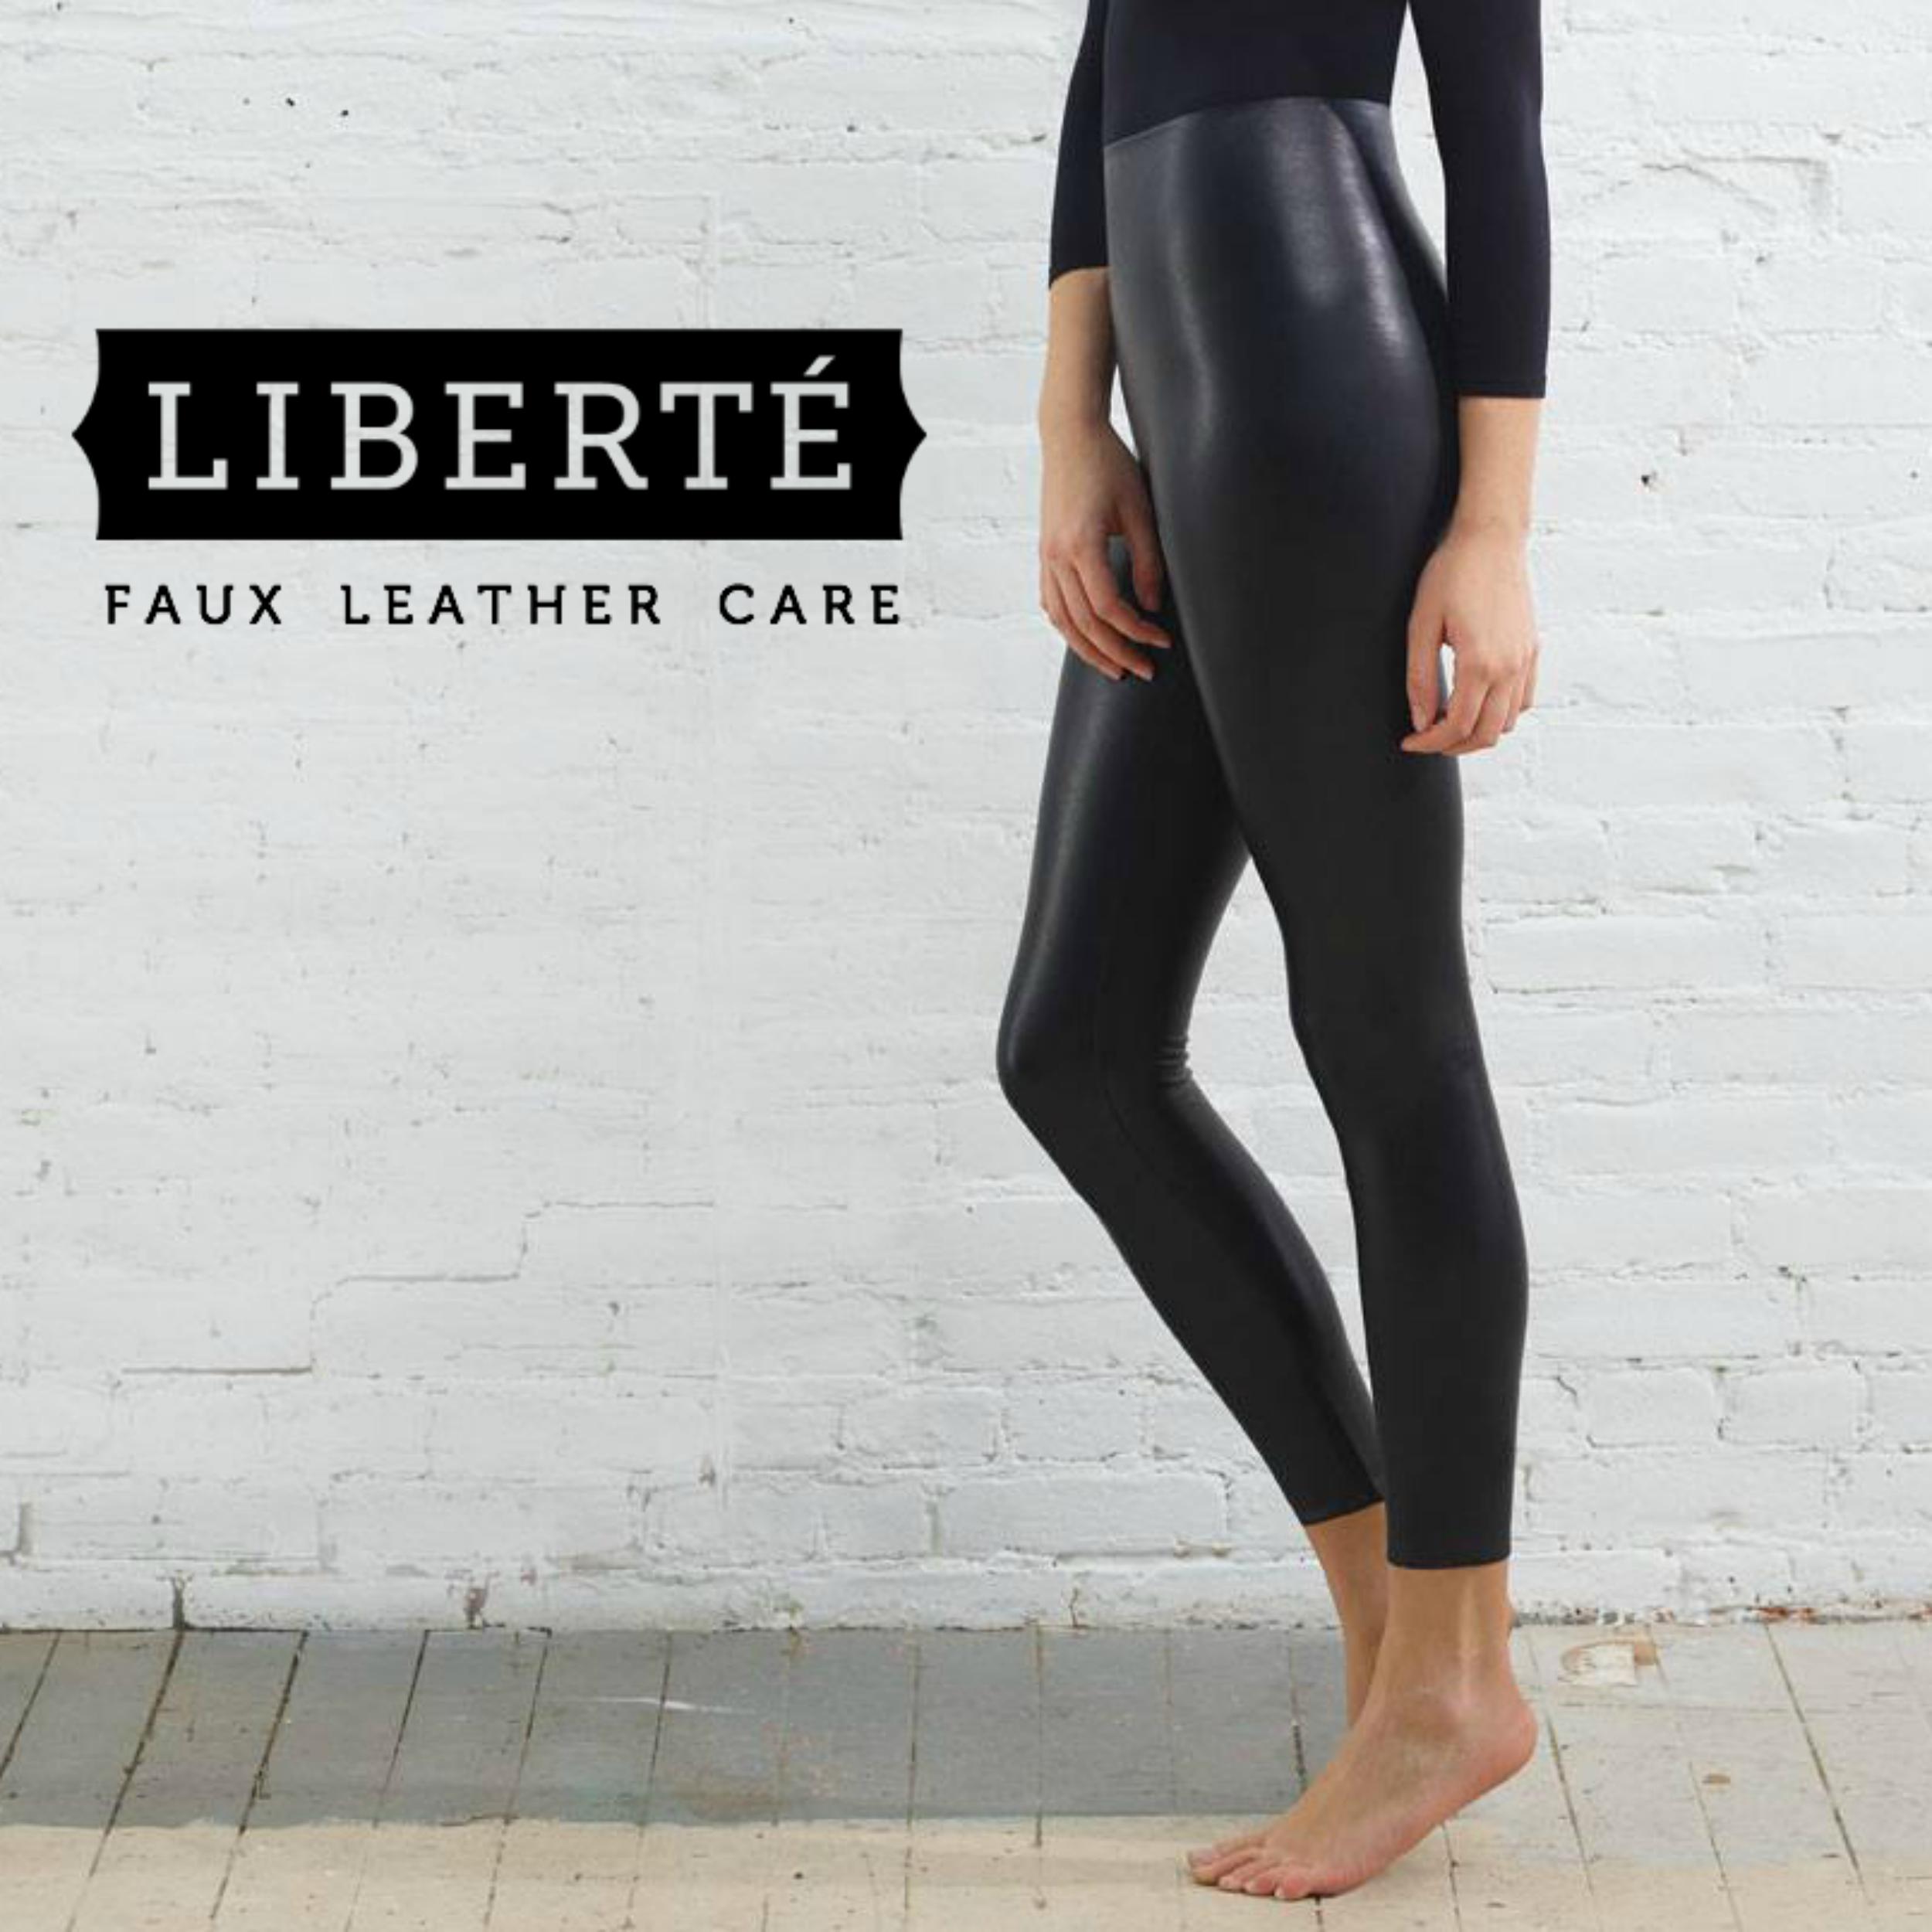 LIBERTE_Laundress_Faux_Leather_Care.png